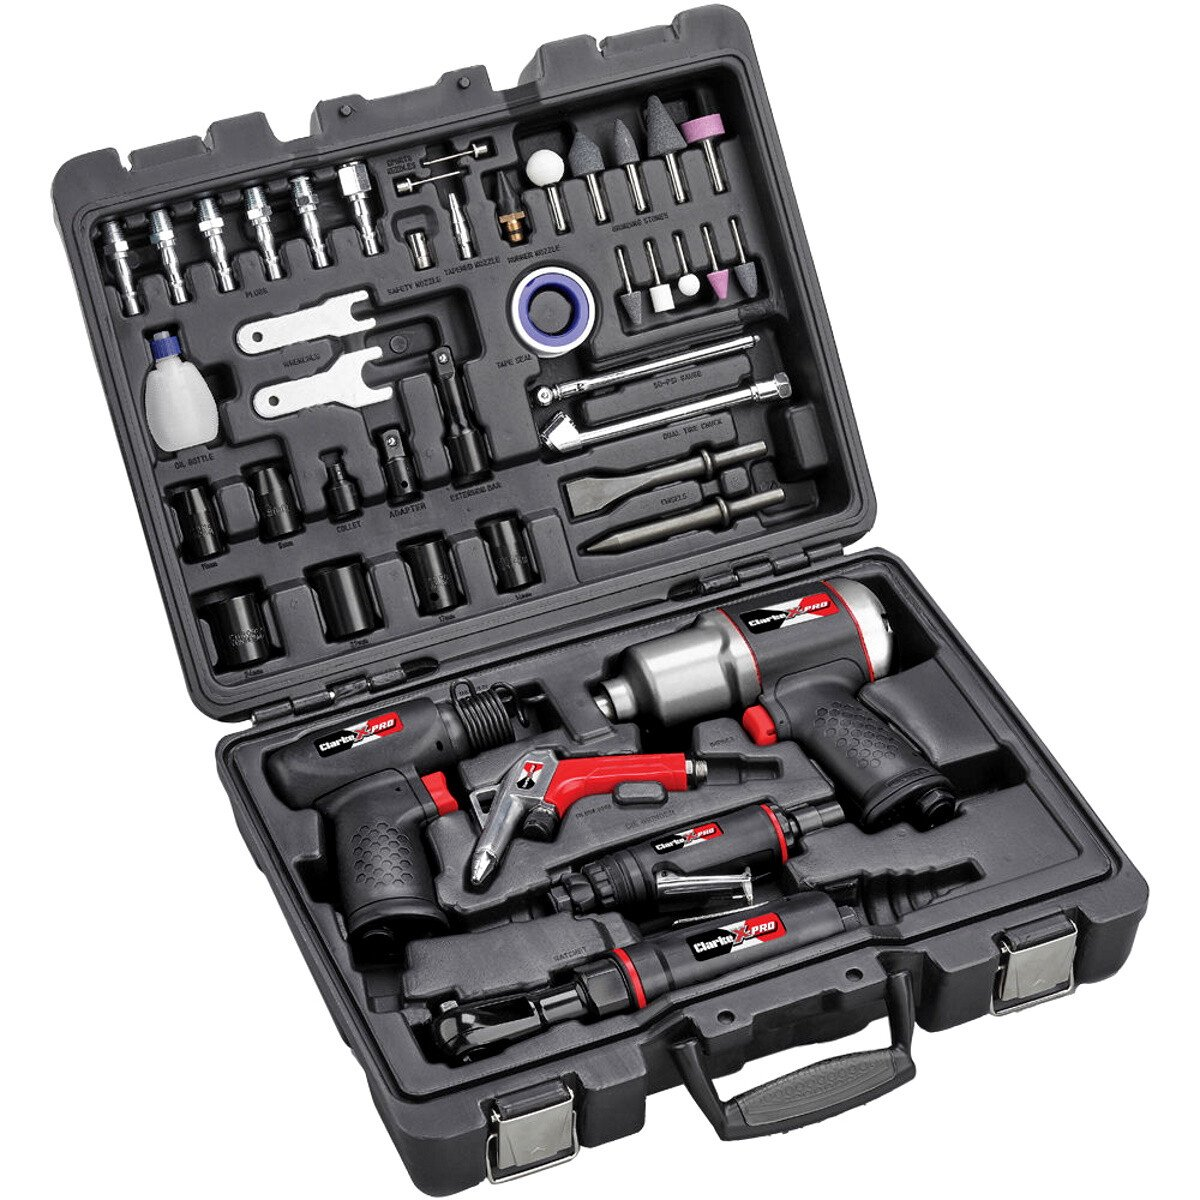 Clarke CAT202 X-Pro 44 Piece Composite Body Air Tool Kit 3120519